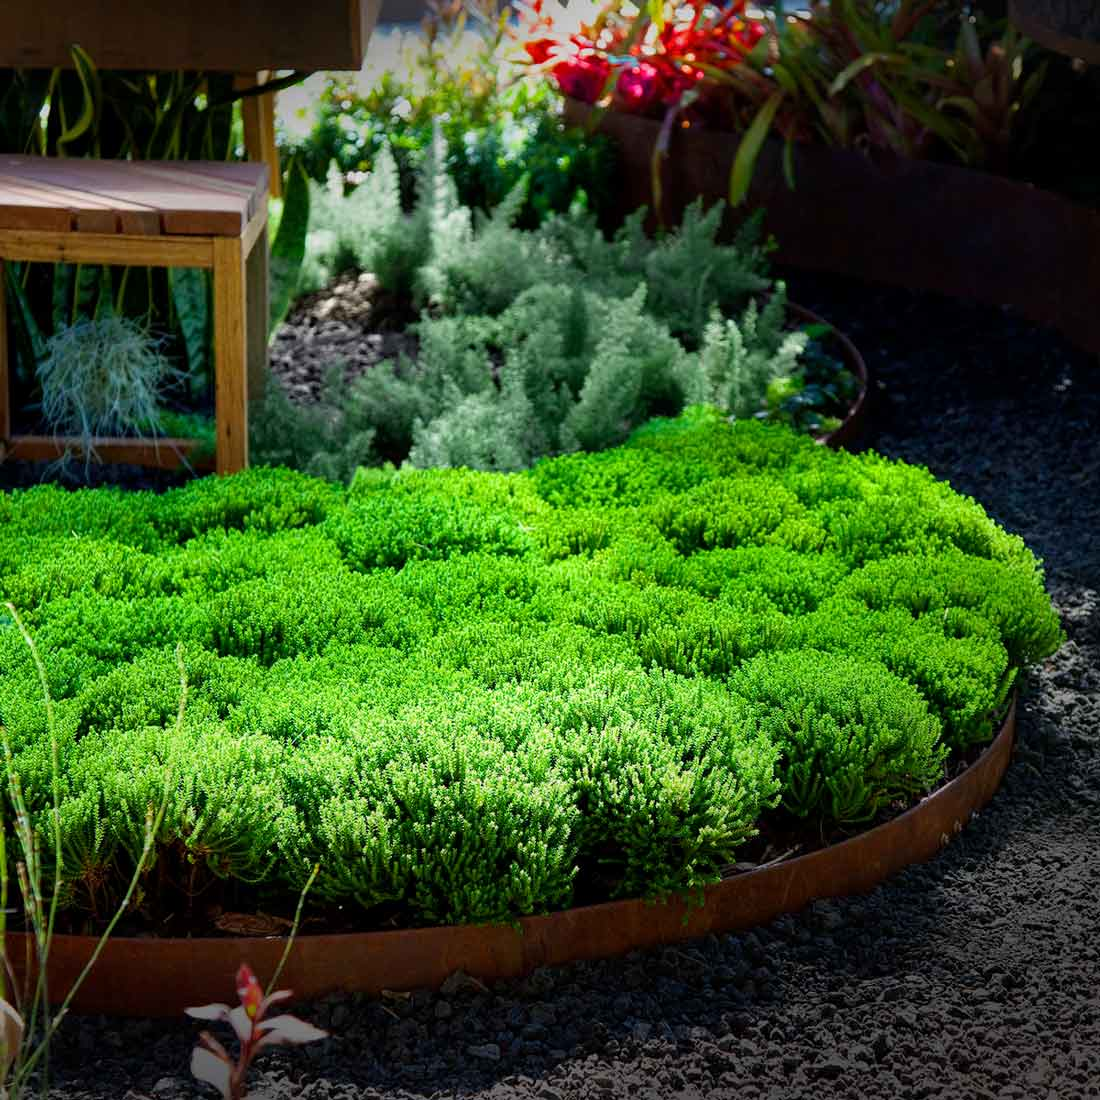 planting-design.jpg